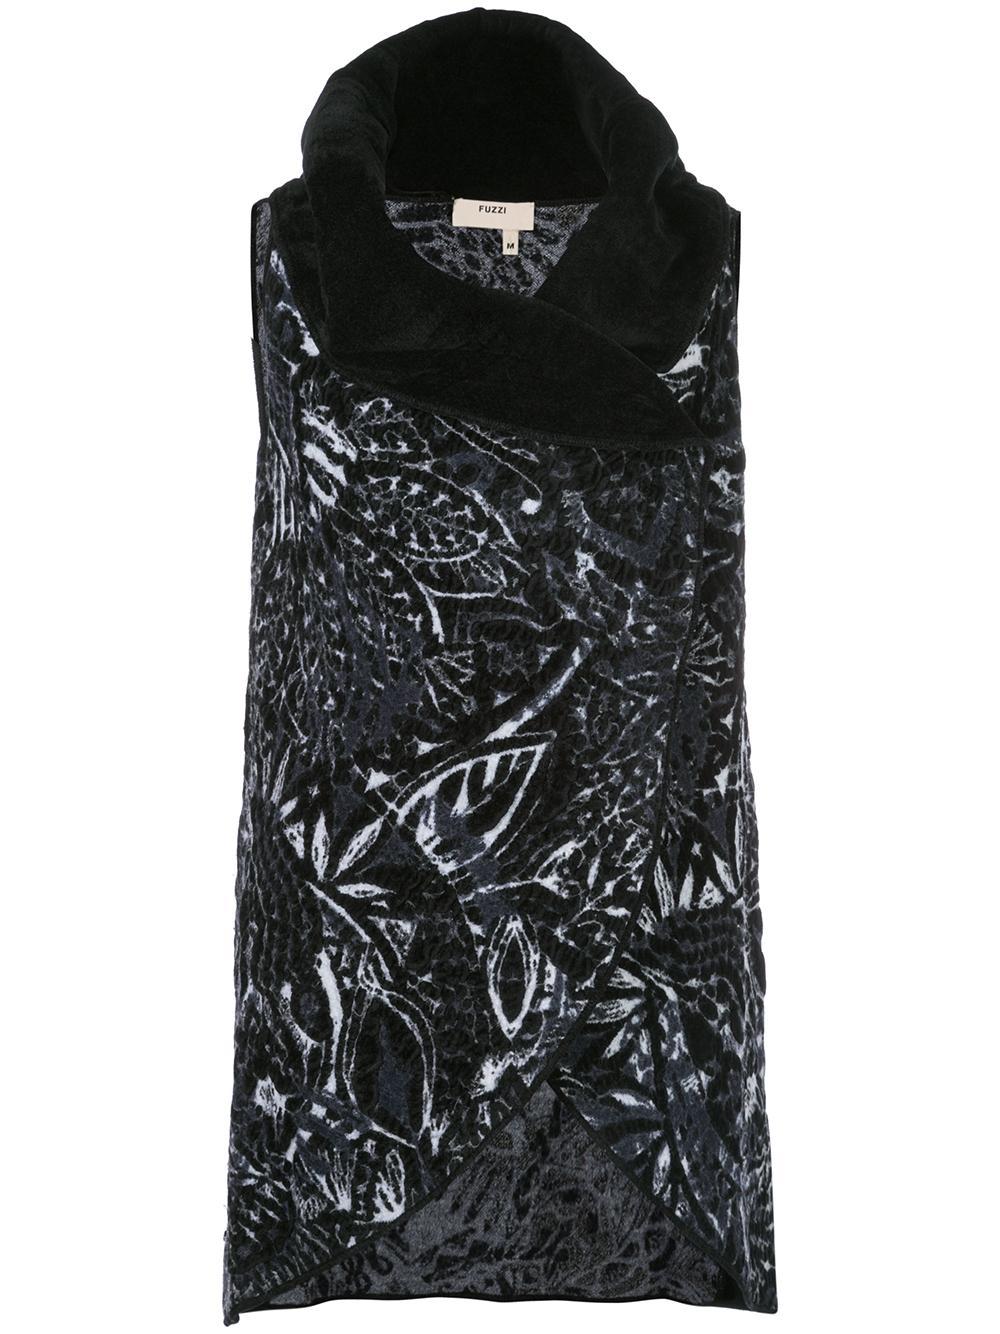 Printed Vest Item # F91813